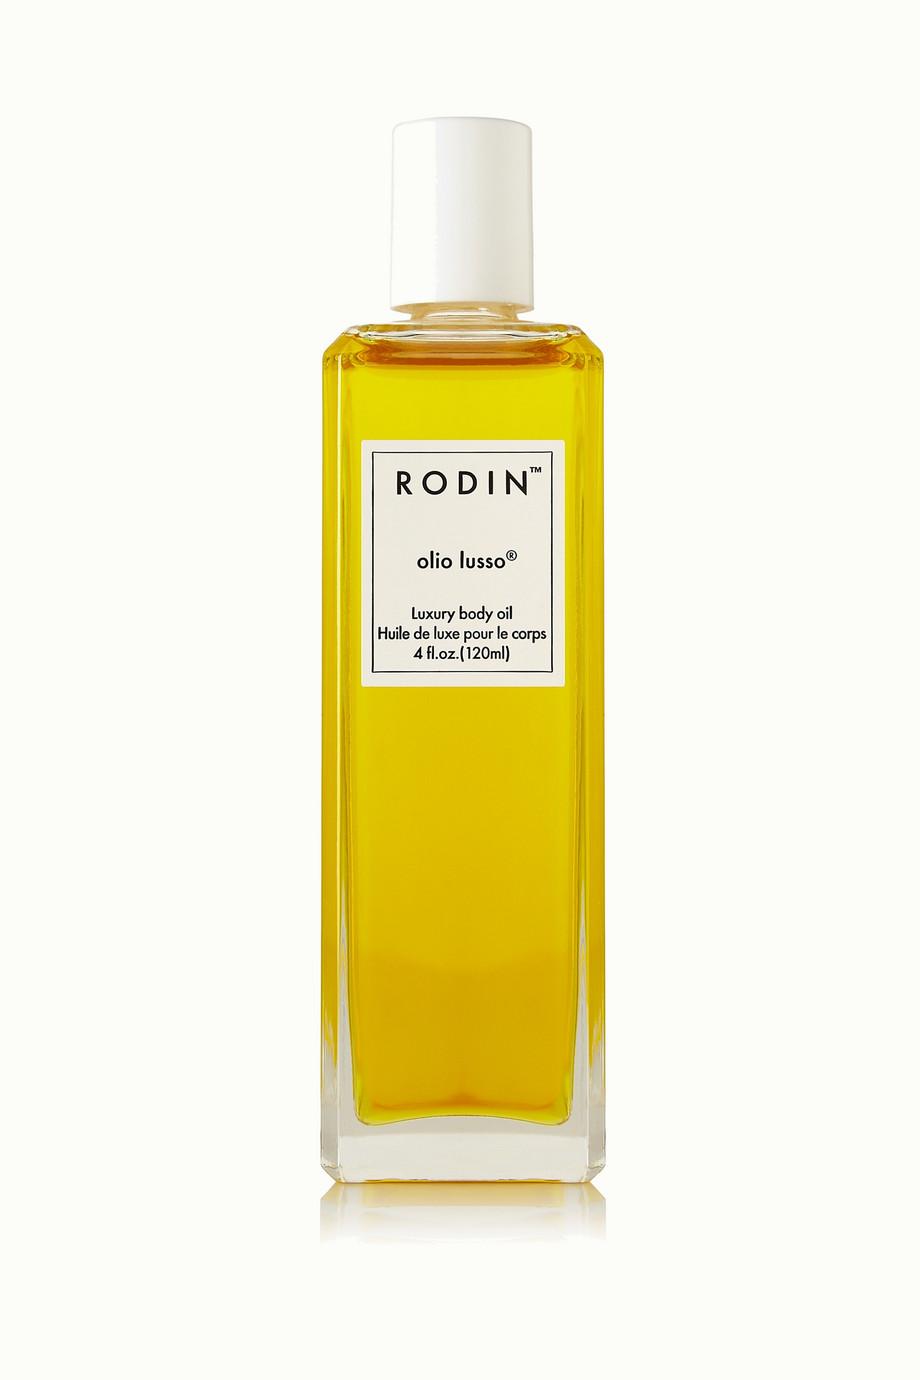 Rodin 奢华身体护理油,120ml